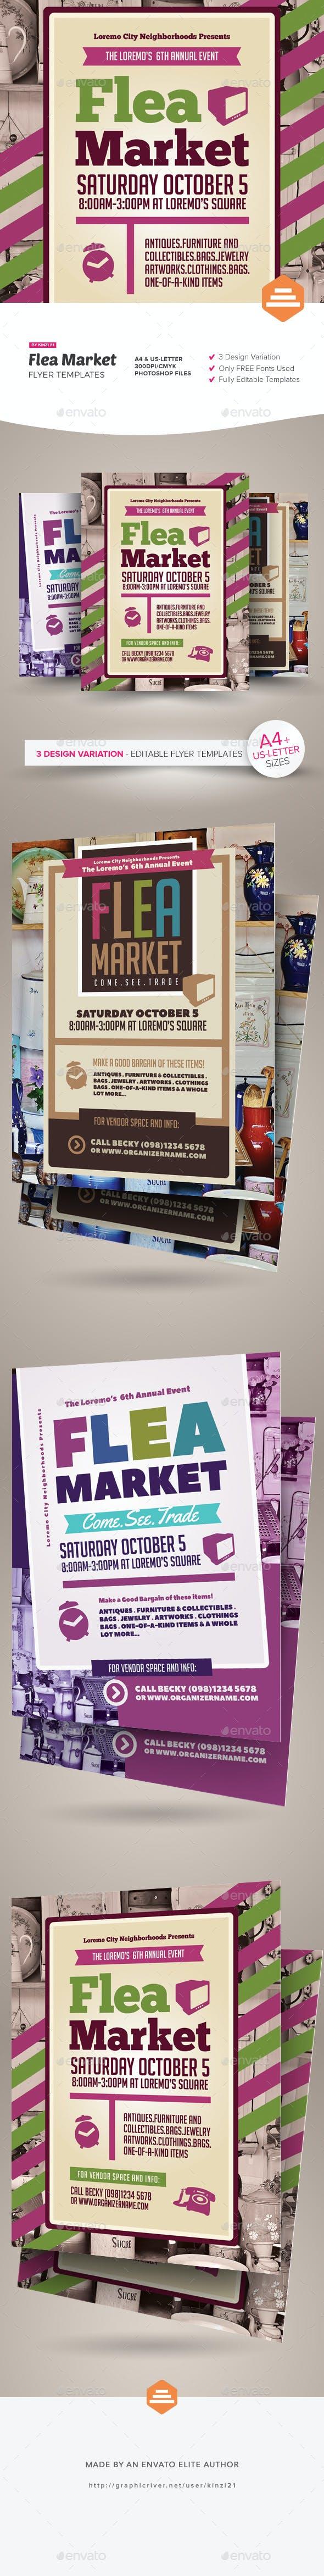 flea market flyer templates by kinzi21 graphicriver